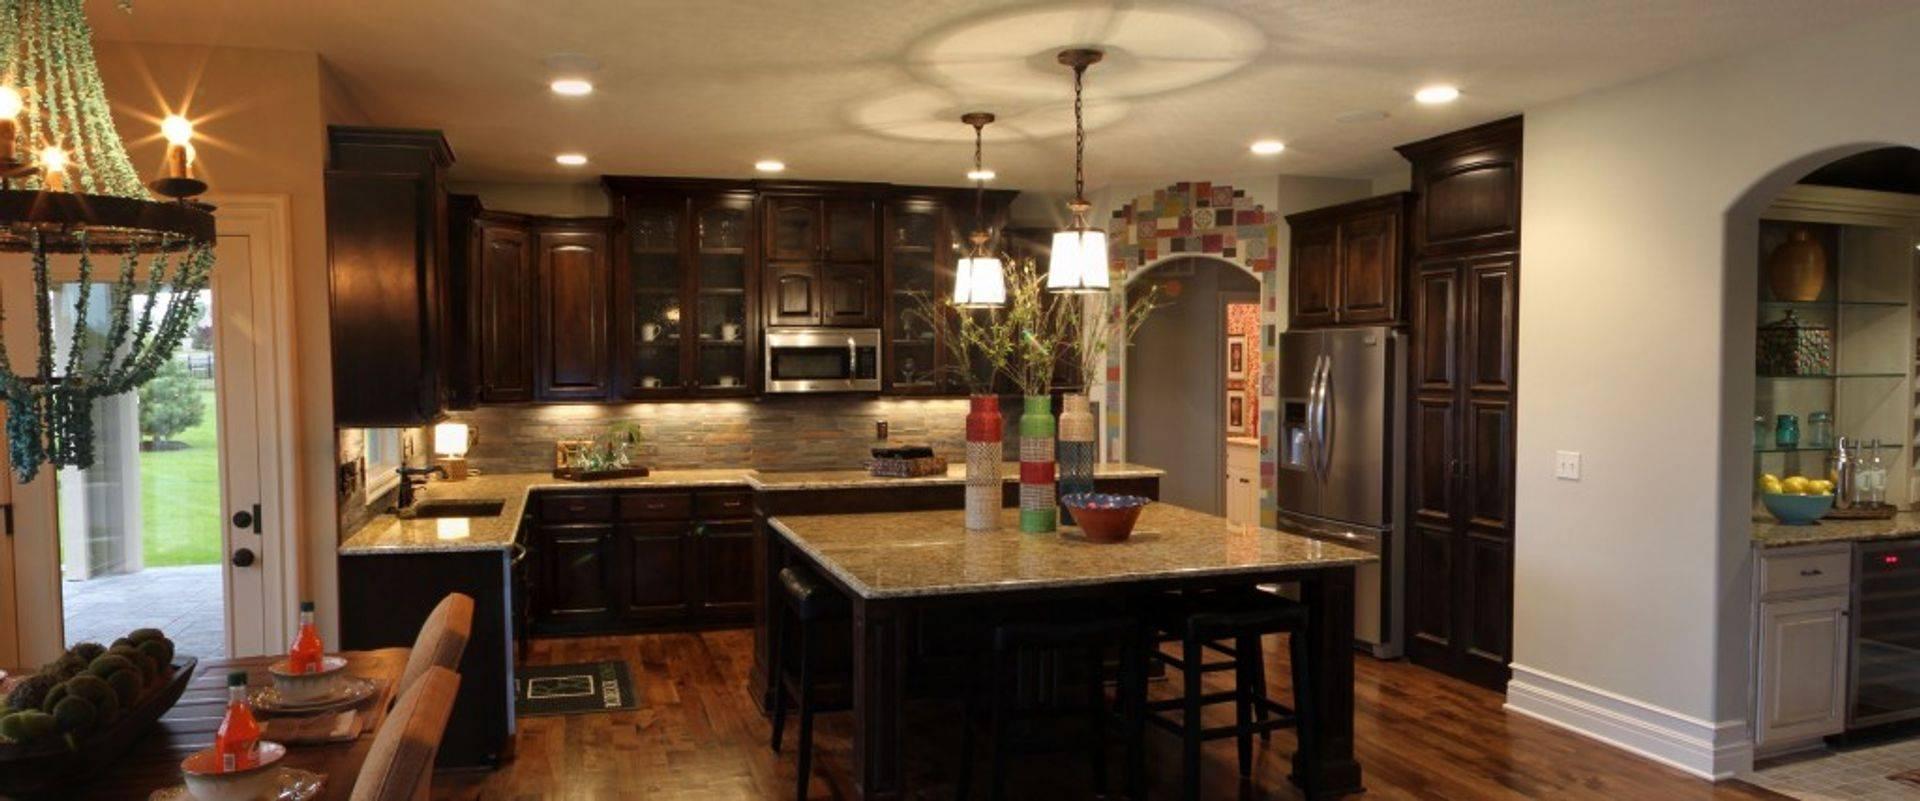 home interiors elkridge visit model home interiors clearance center for big 18 top model home